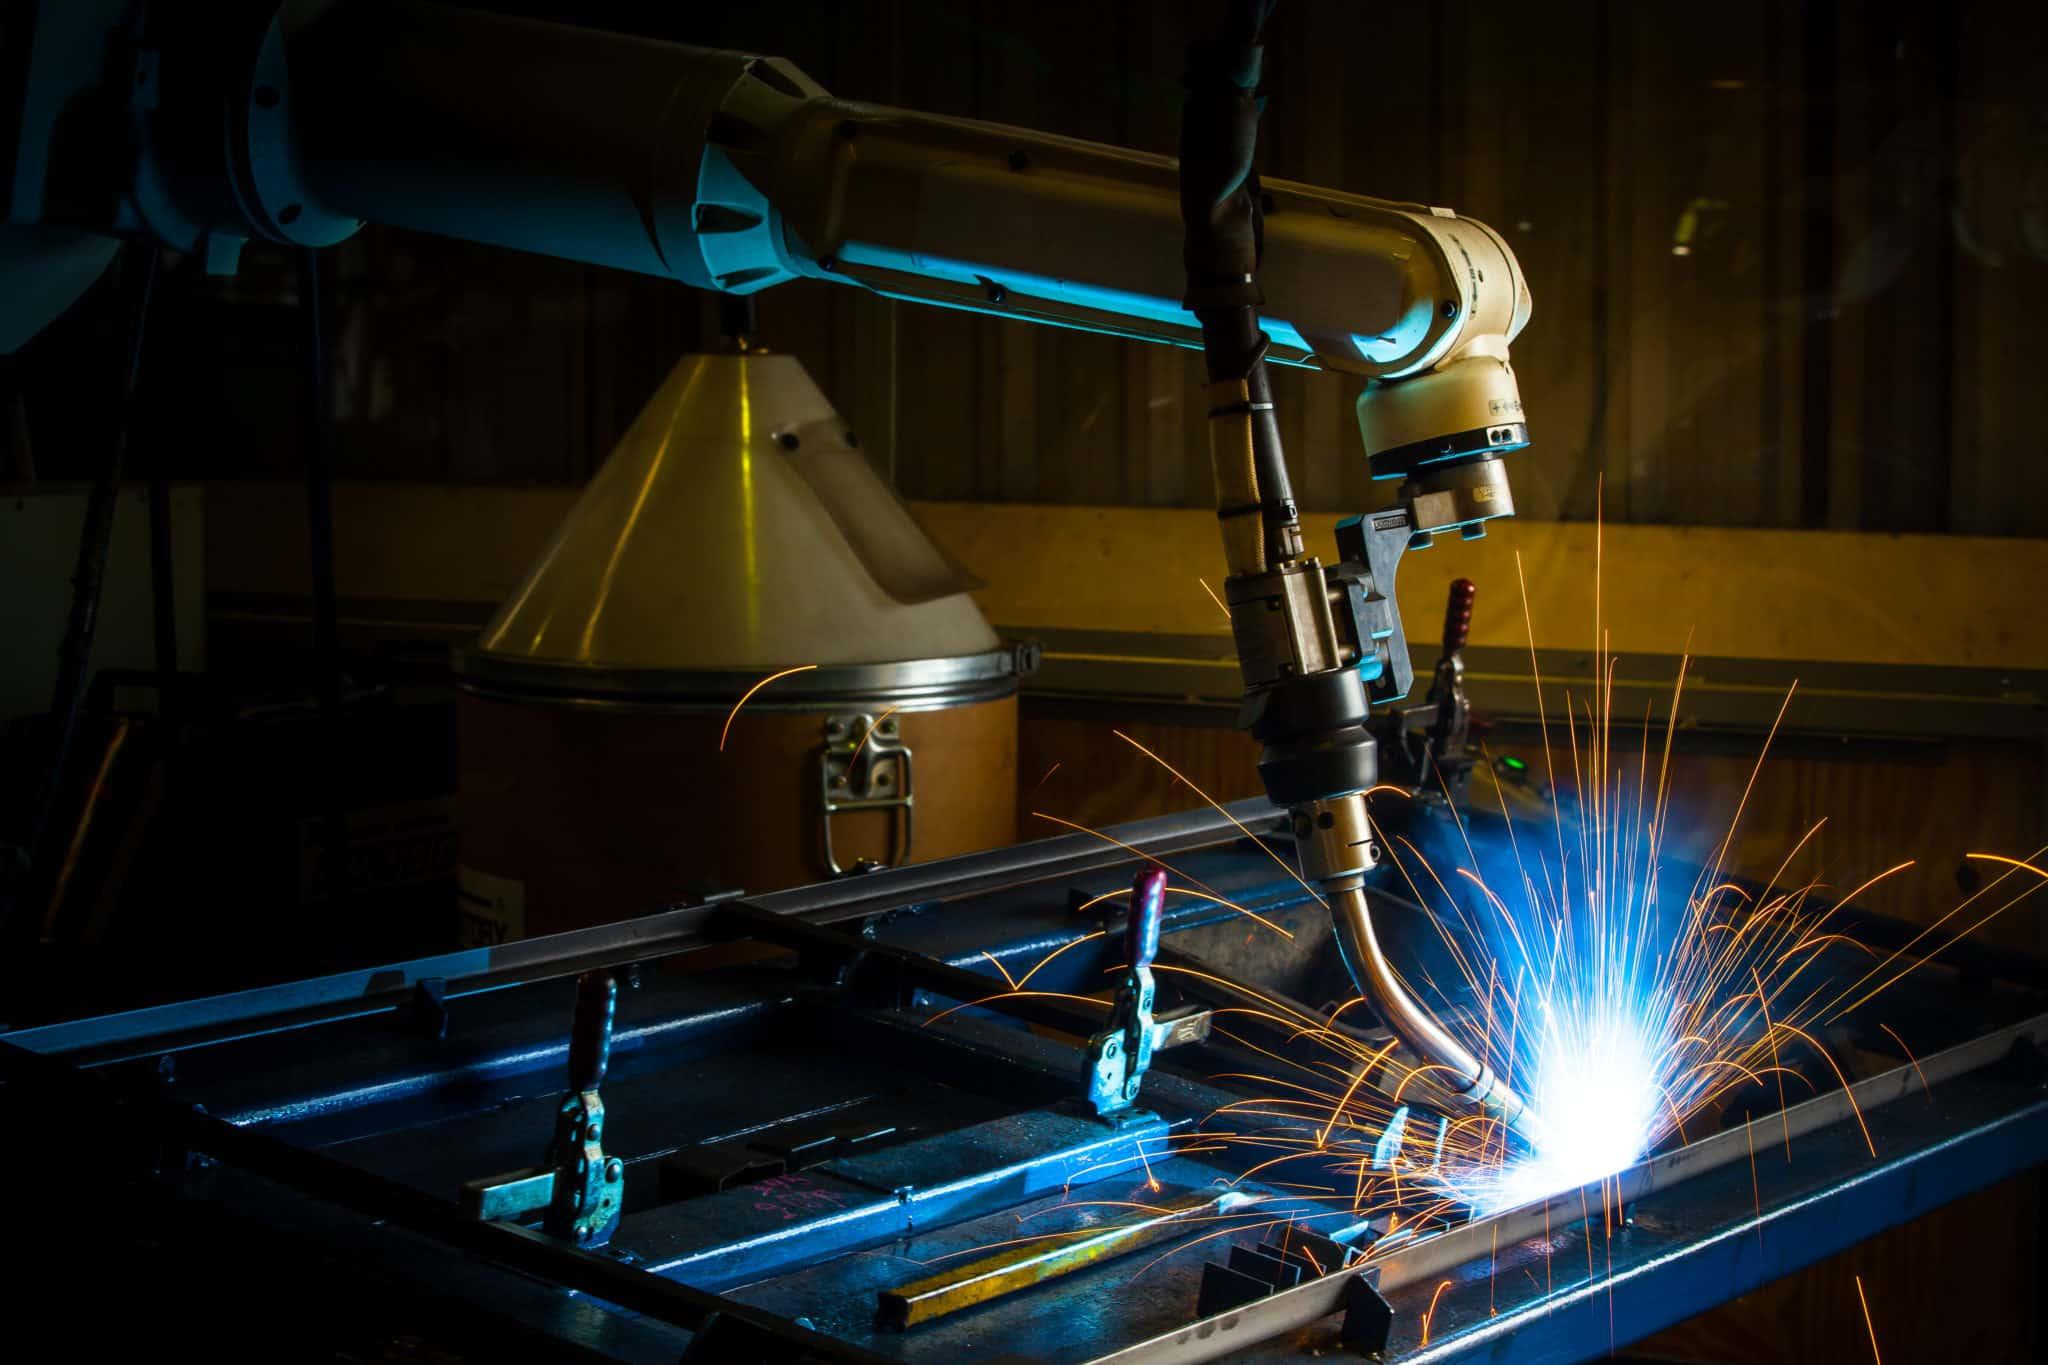 welding machine in high flux scene